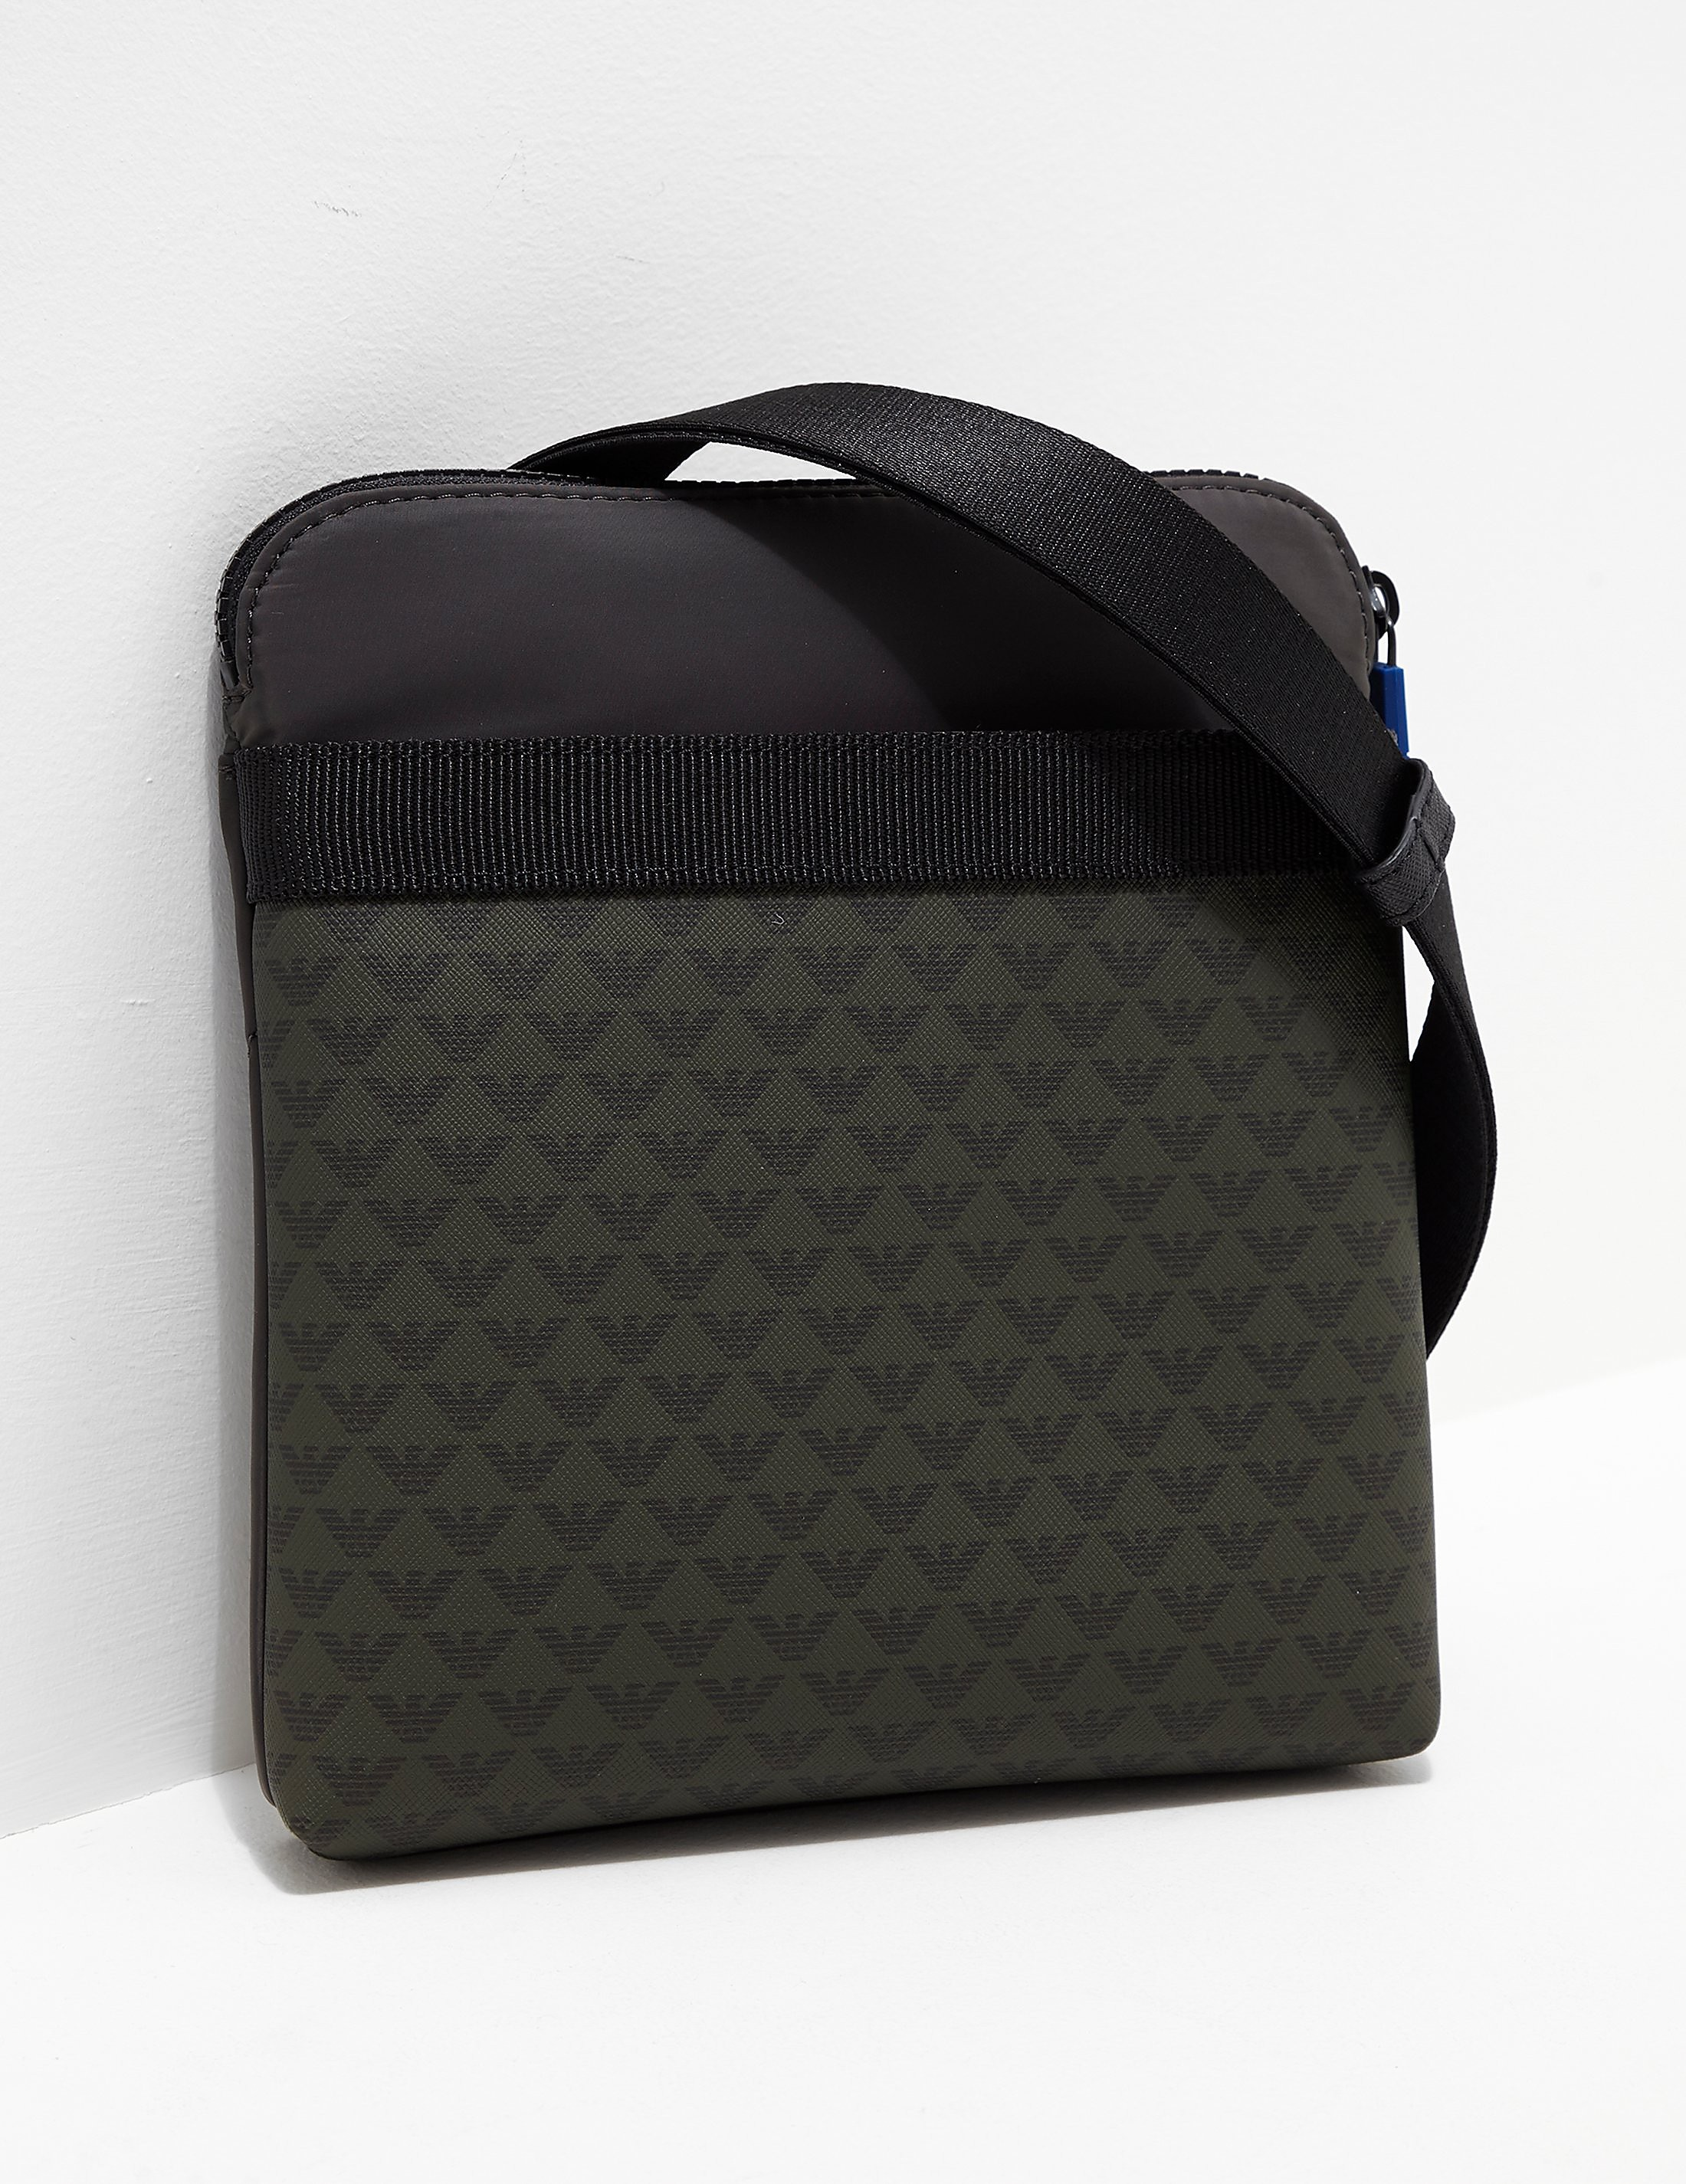 Emporio Armani All Over Eagle Small Item Bag